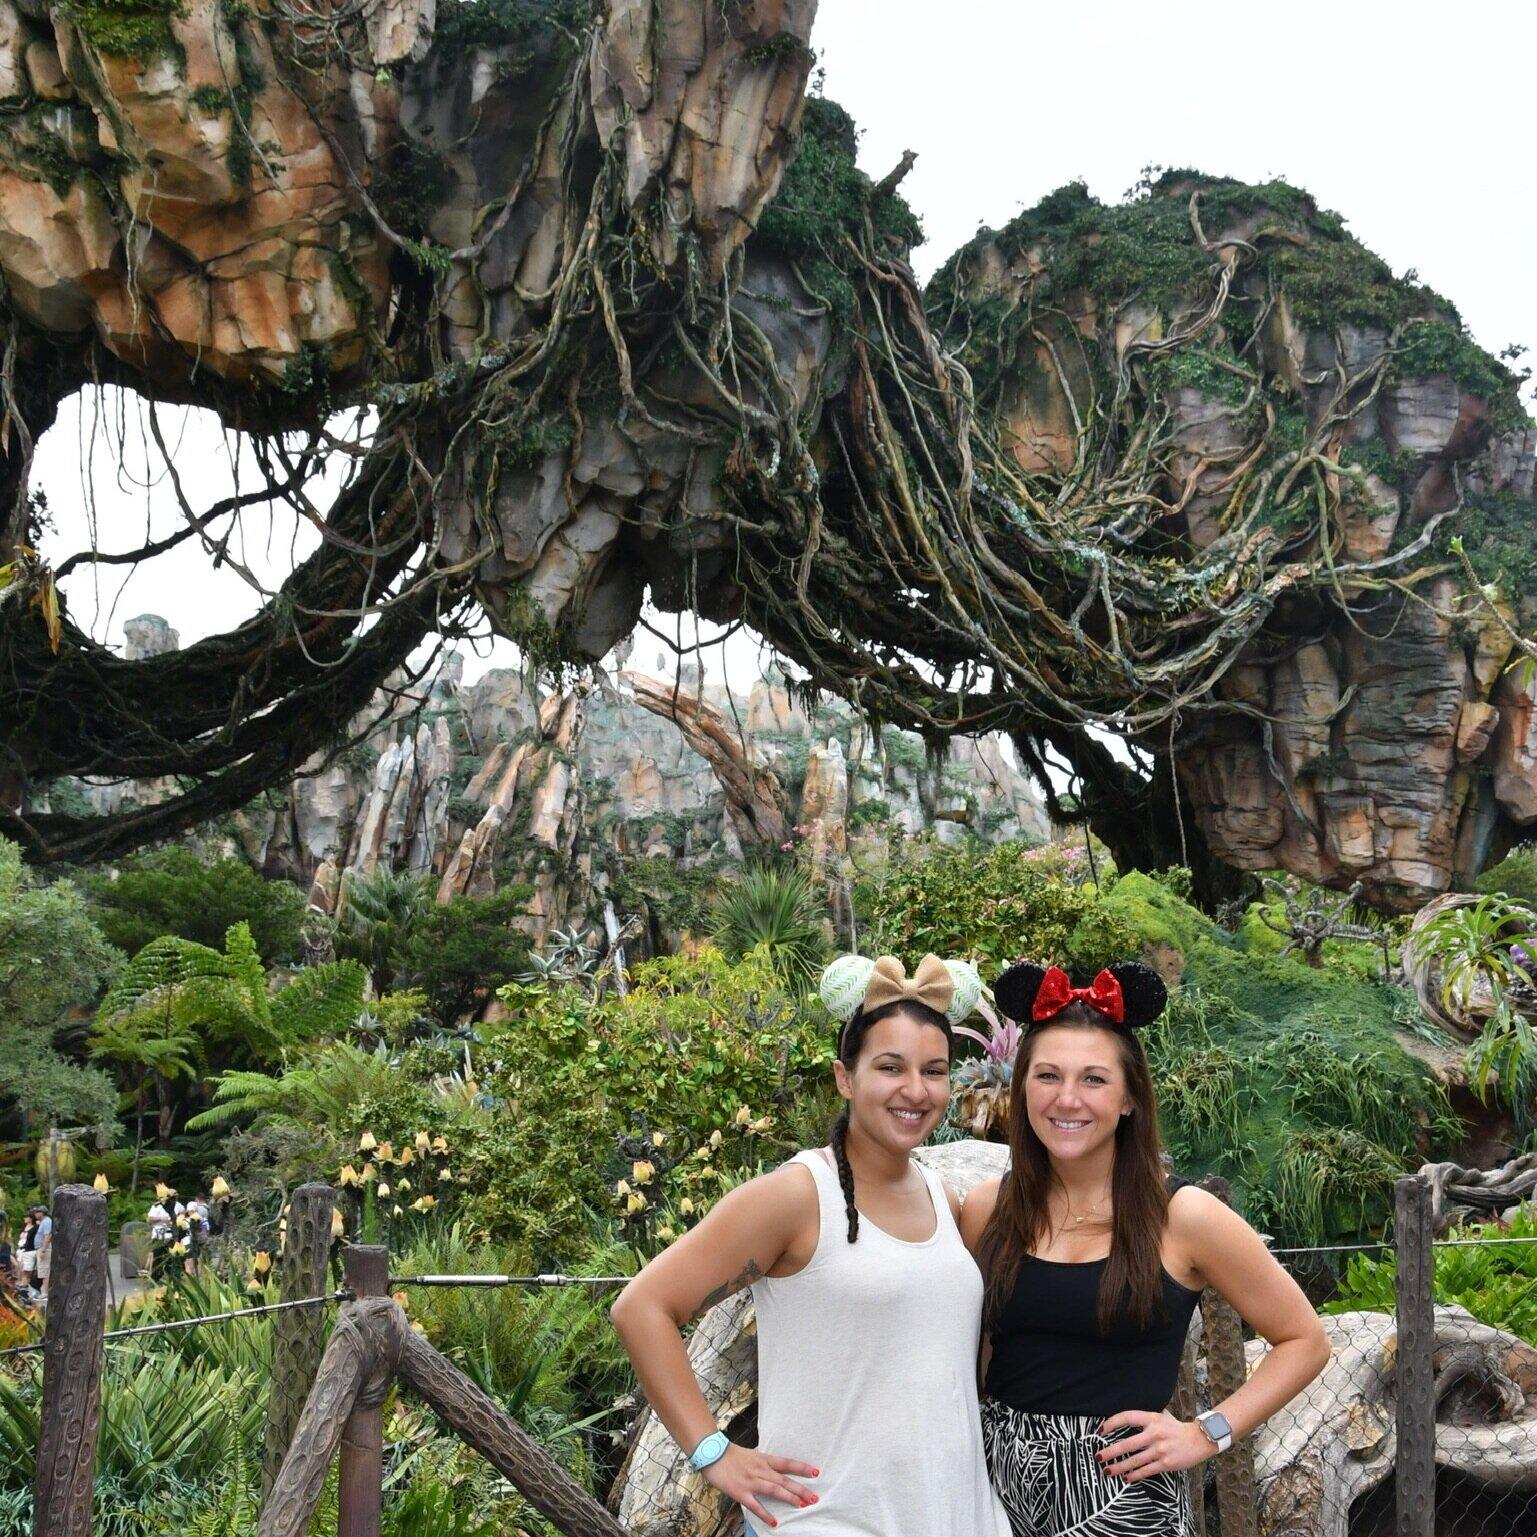 Pandora: World of Avatar at Disney's Animal Kingdom (Disney's PhotoPass)